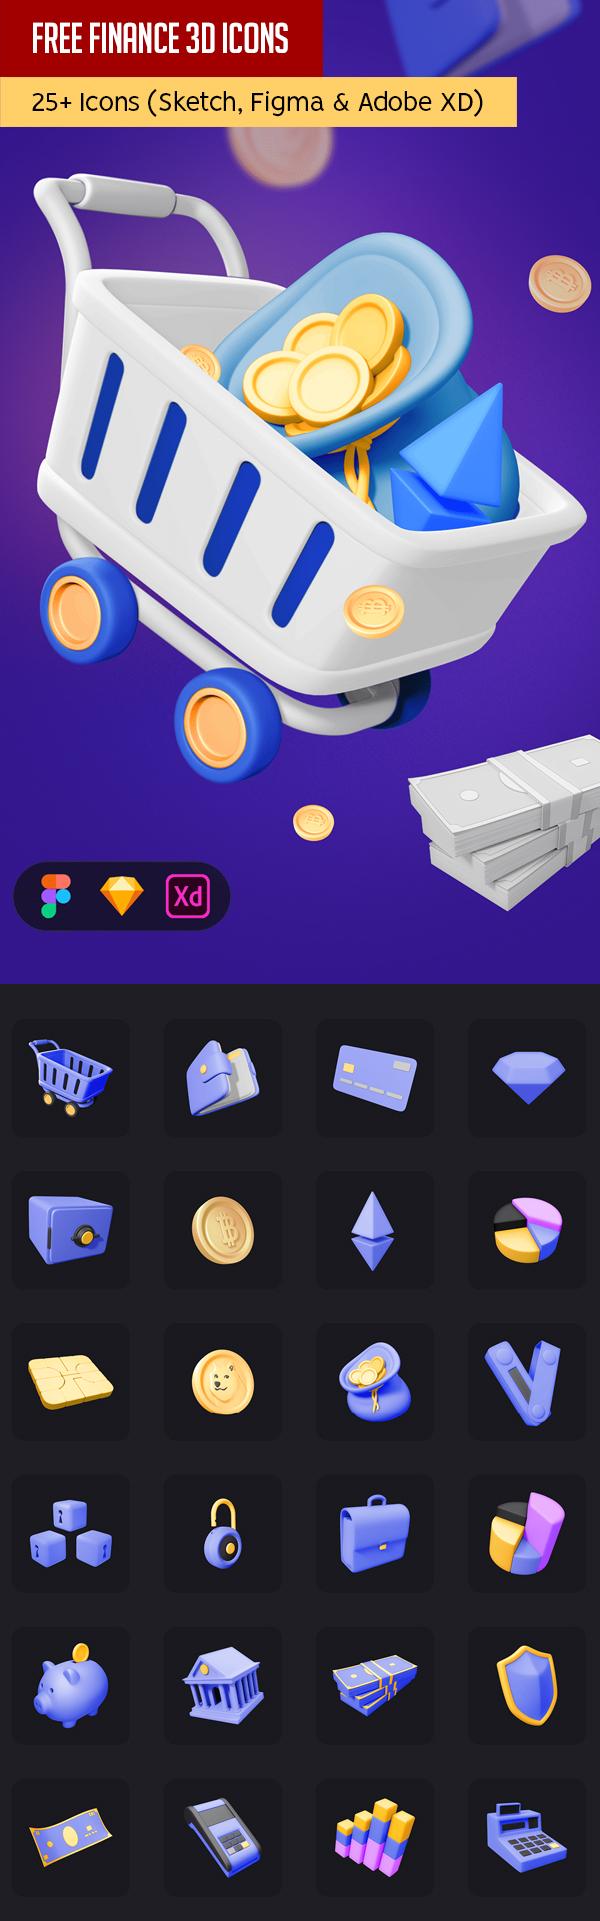 Perfect 3D Icon